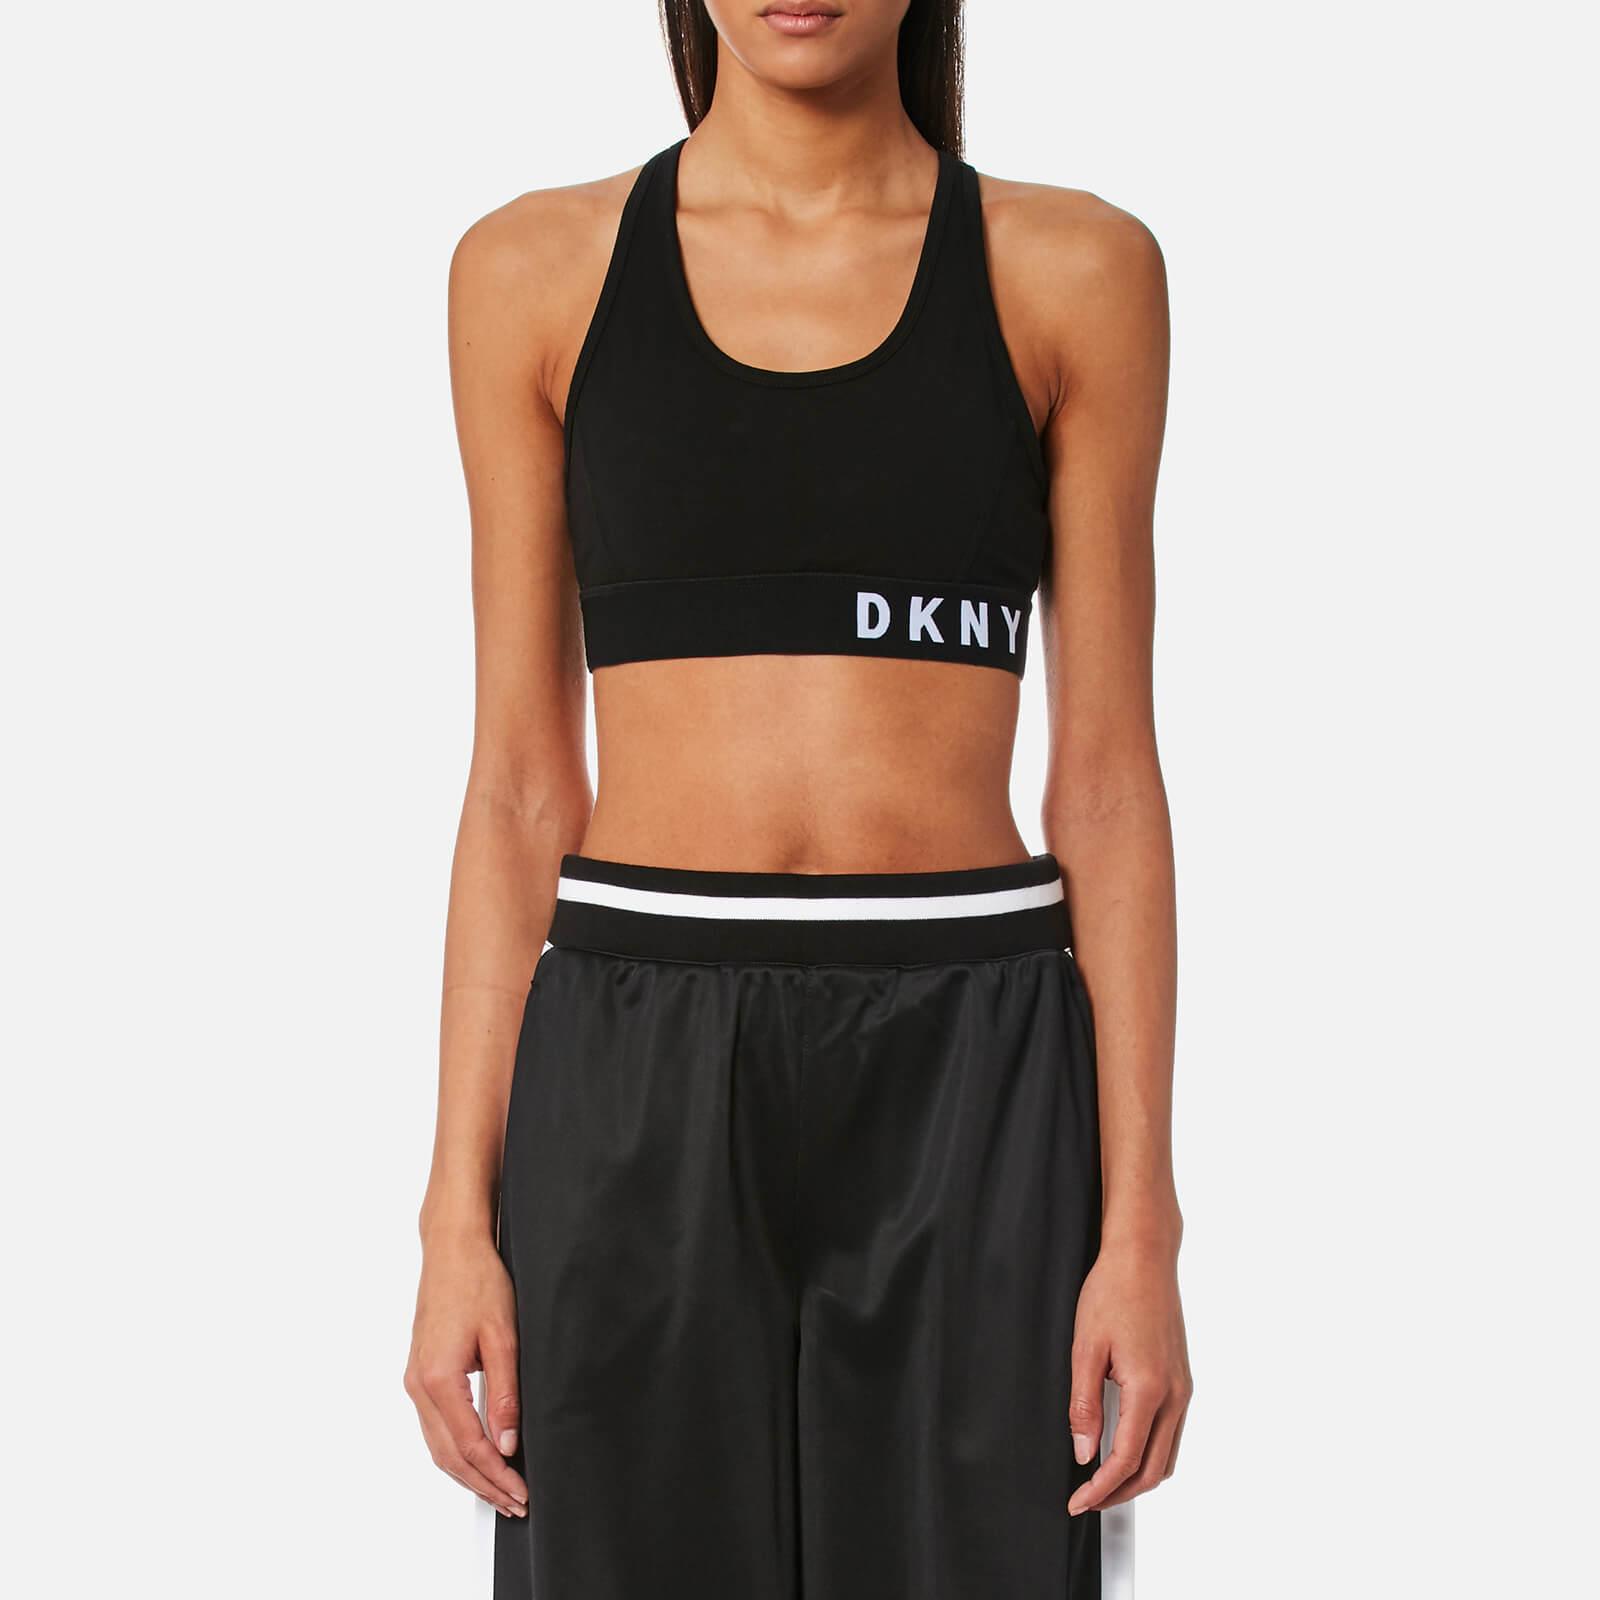 cb07e9014c4 DKNY Sport Women's Low Impact Logo Sports Bra - Black